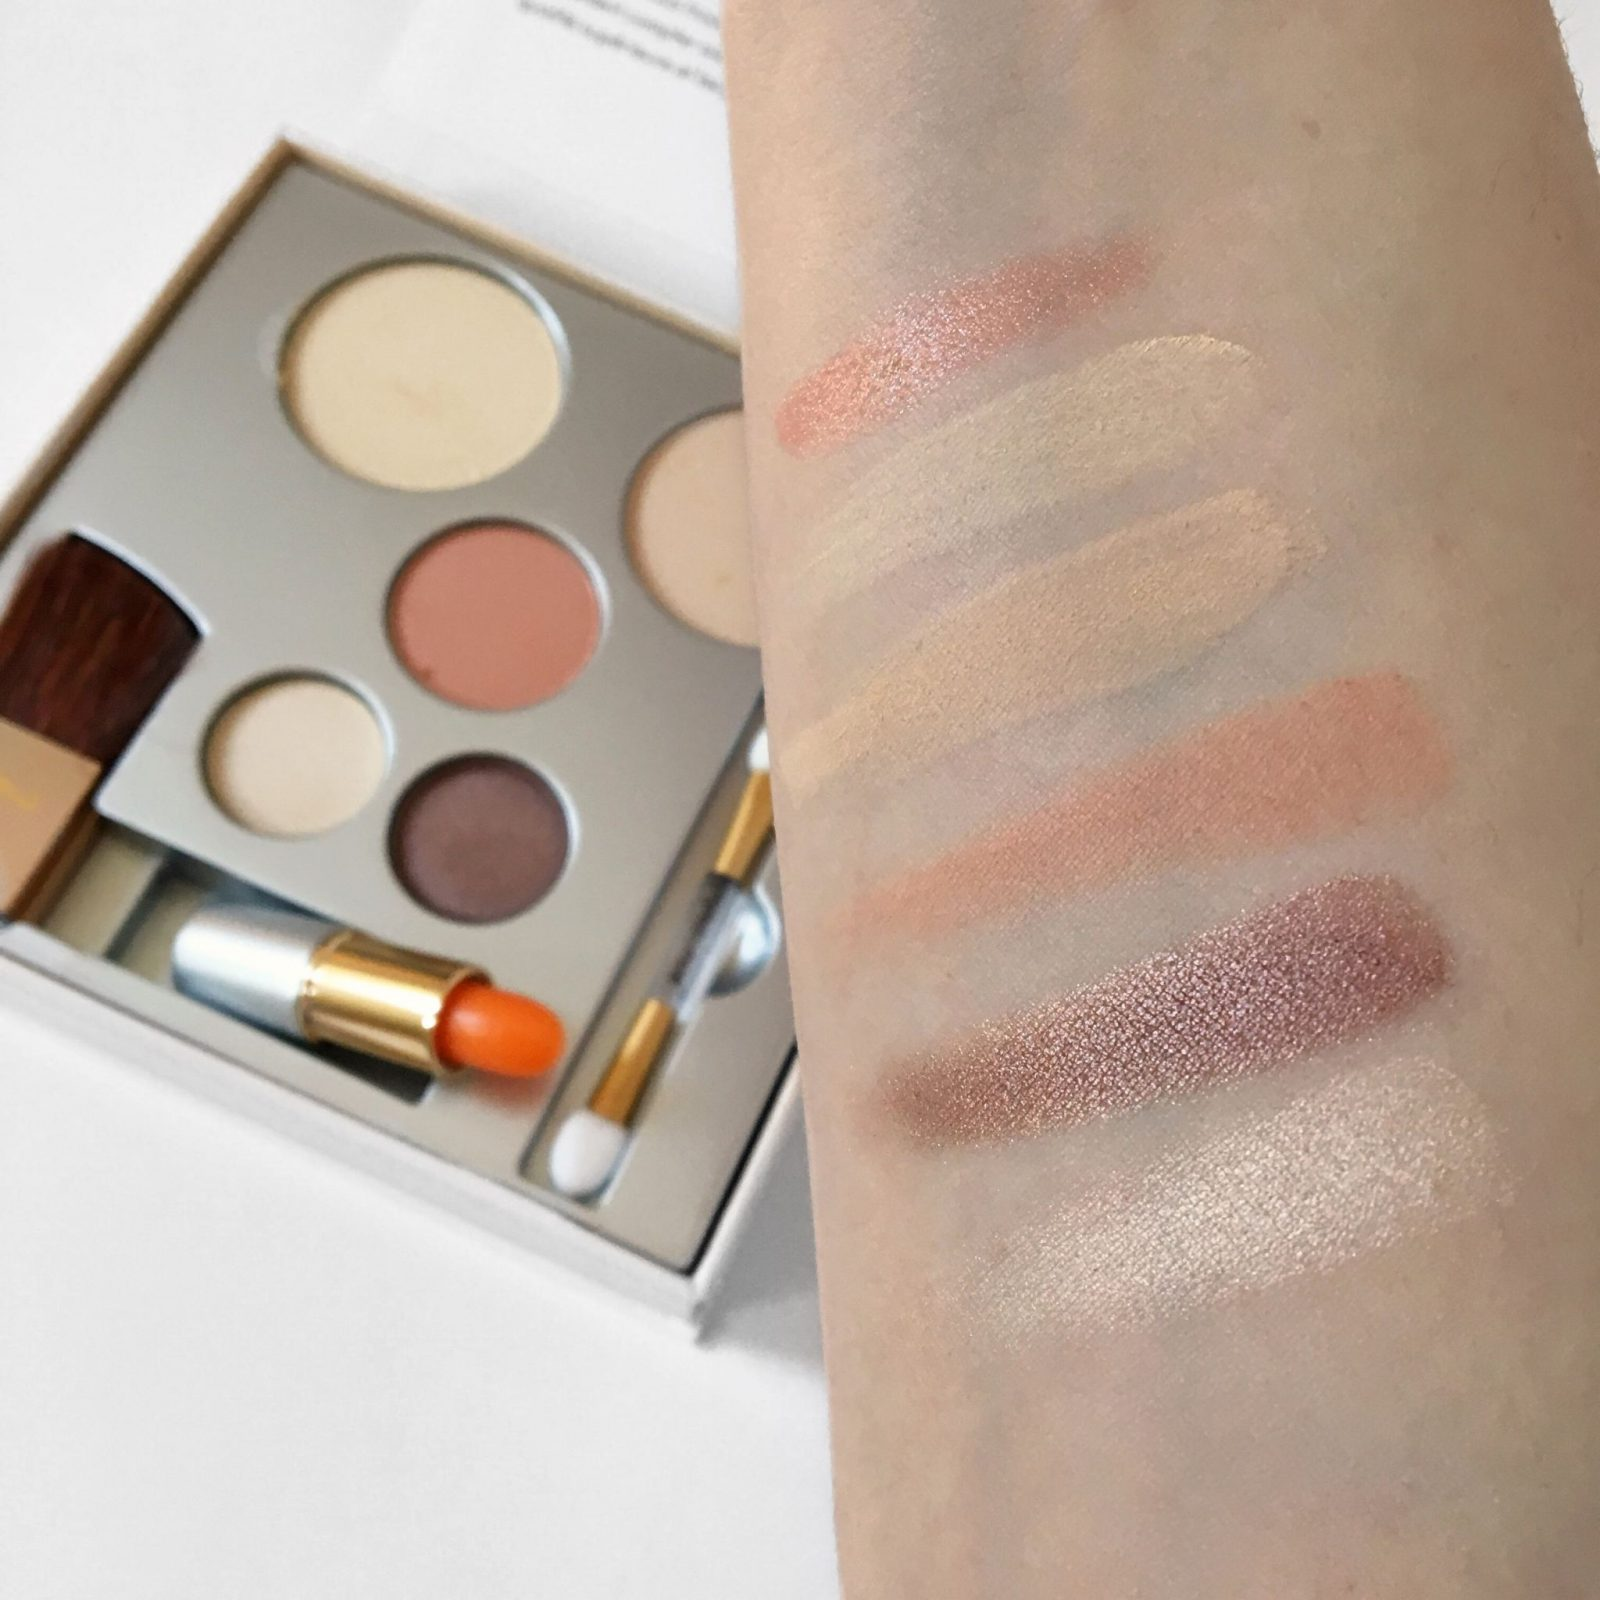 Jane Iredale #PureSimpleYou Makeup Kit Review